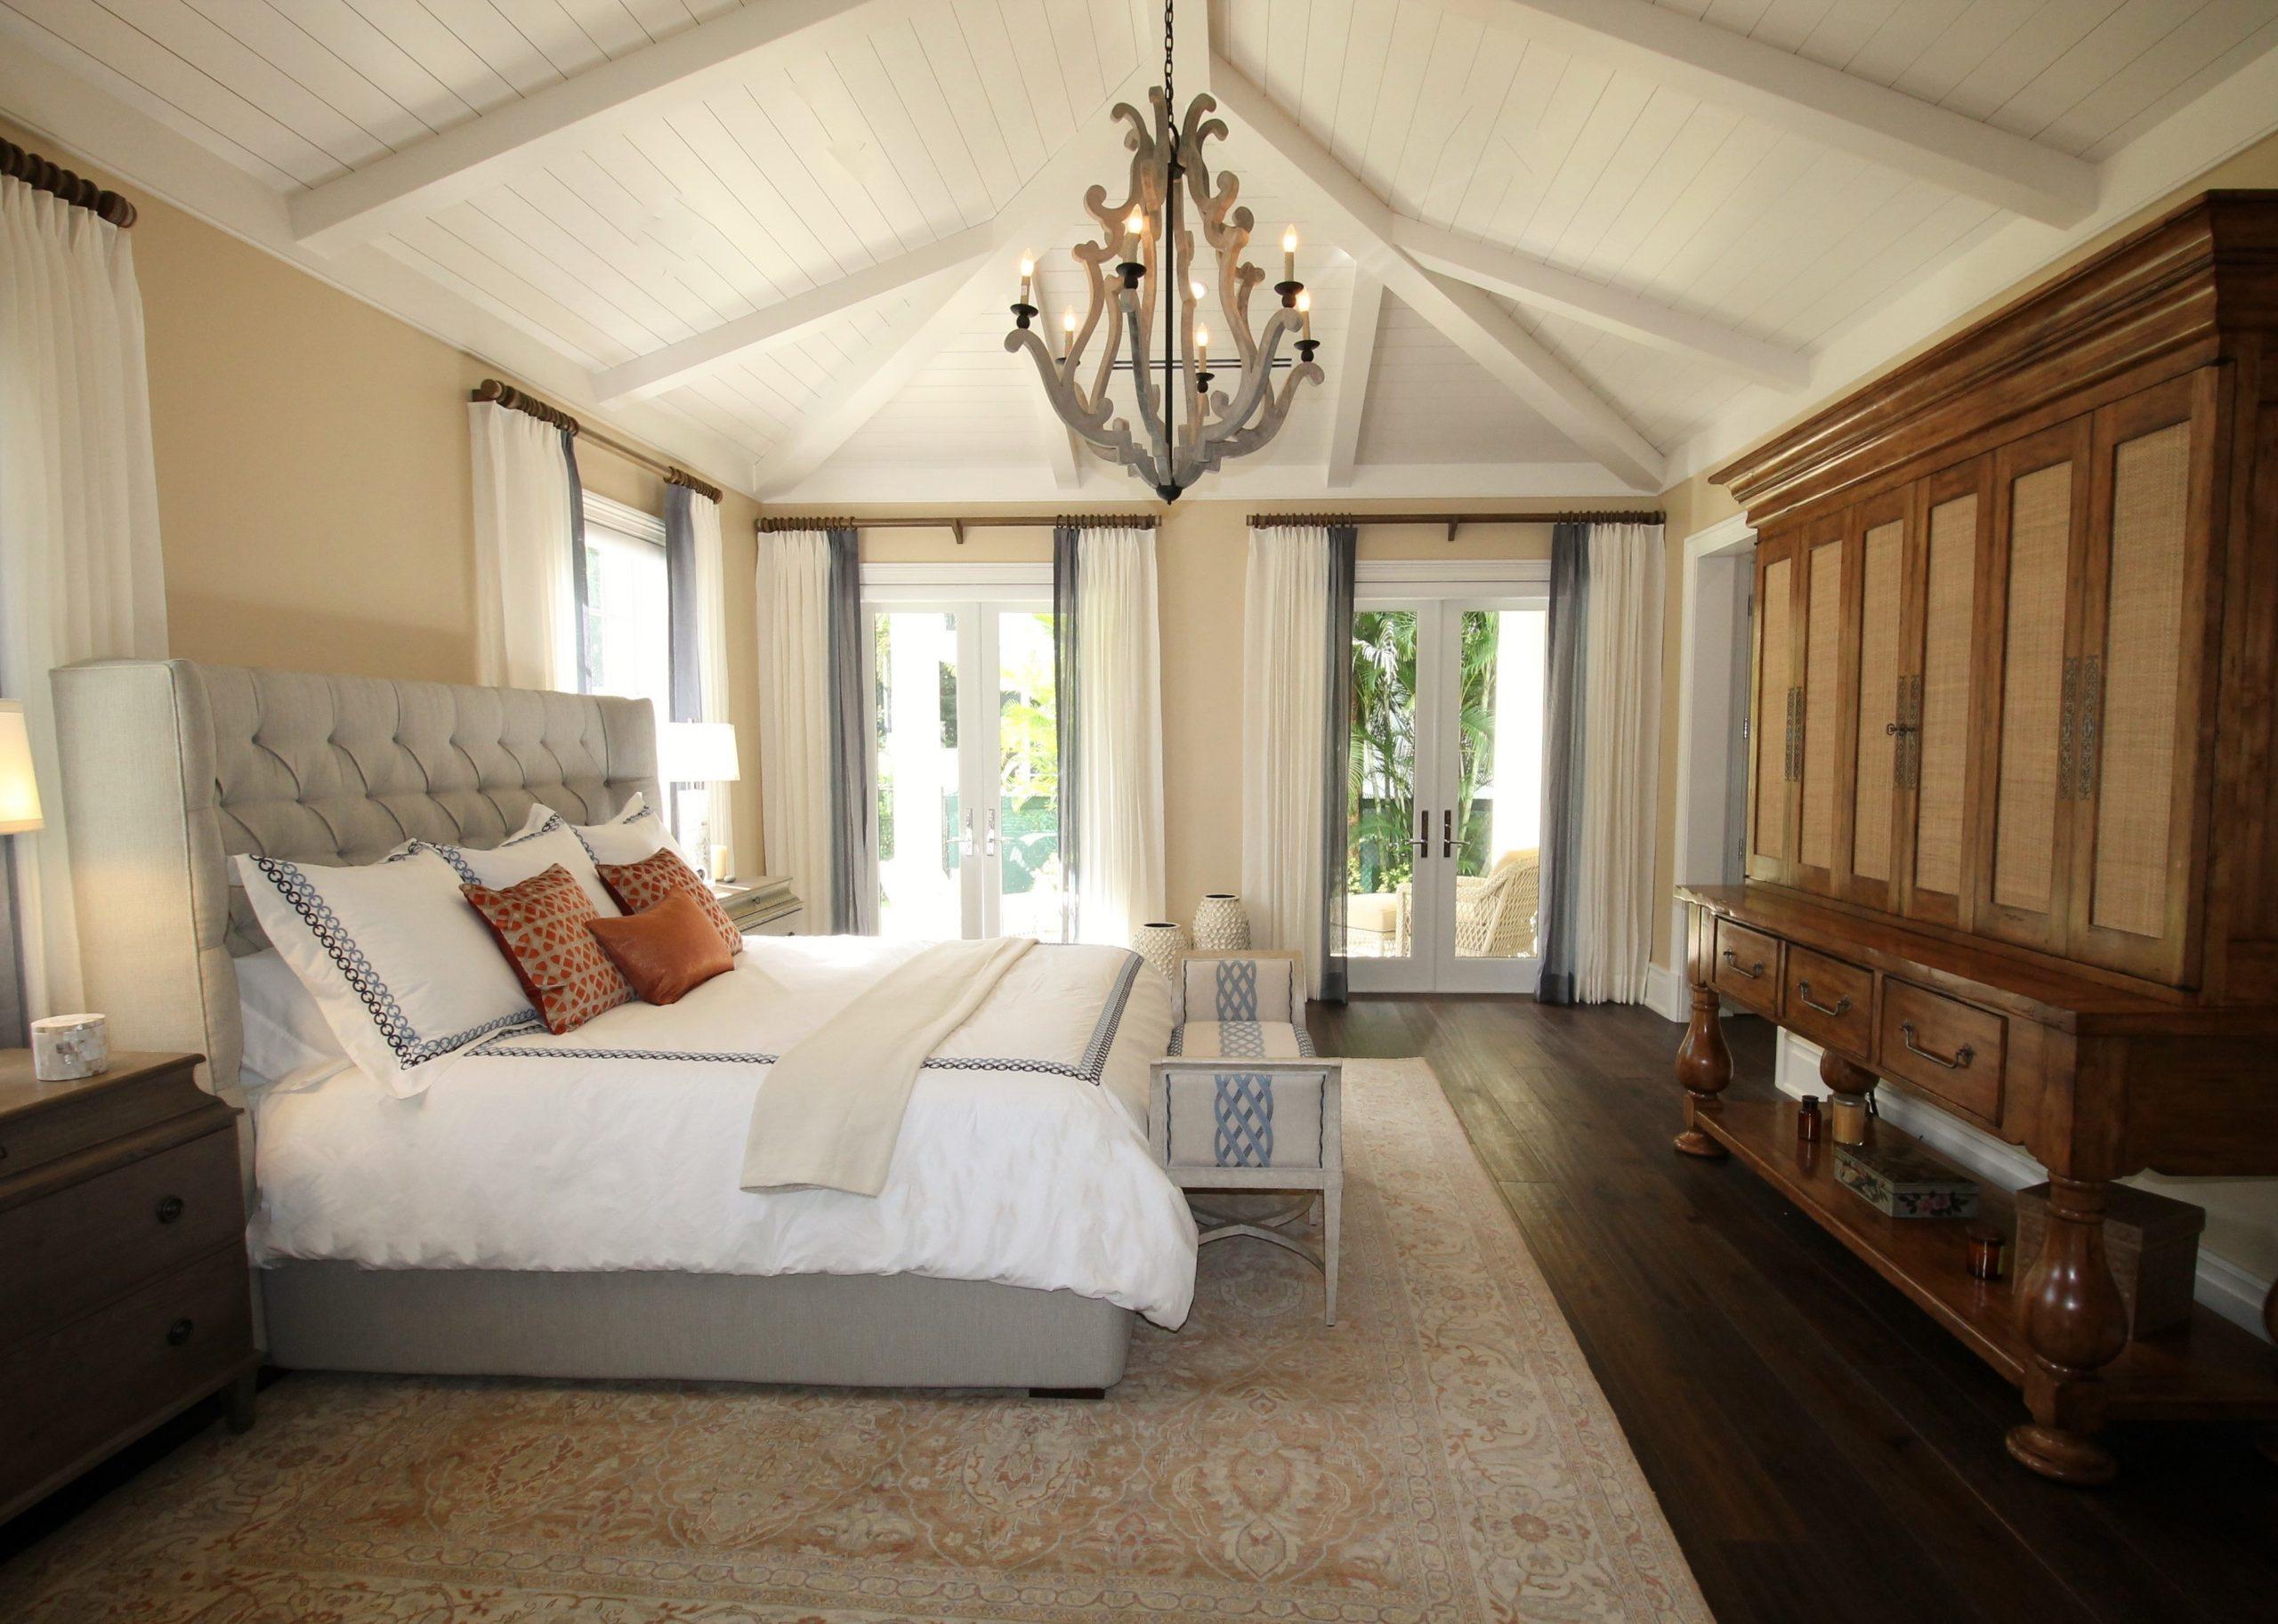 Master Bedroom Decorating - Lighting